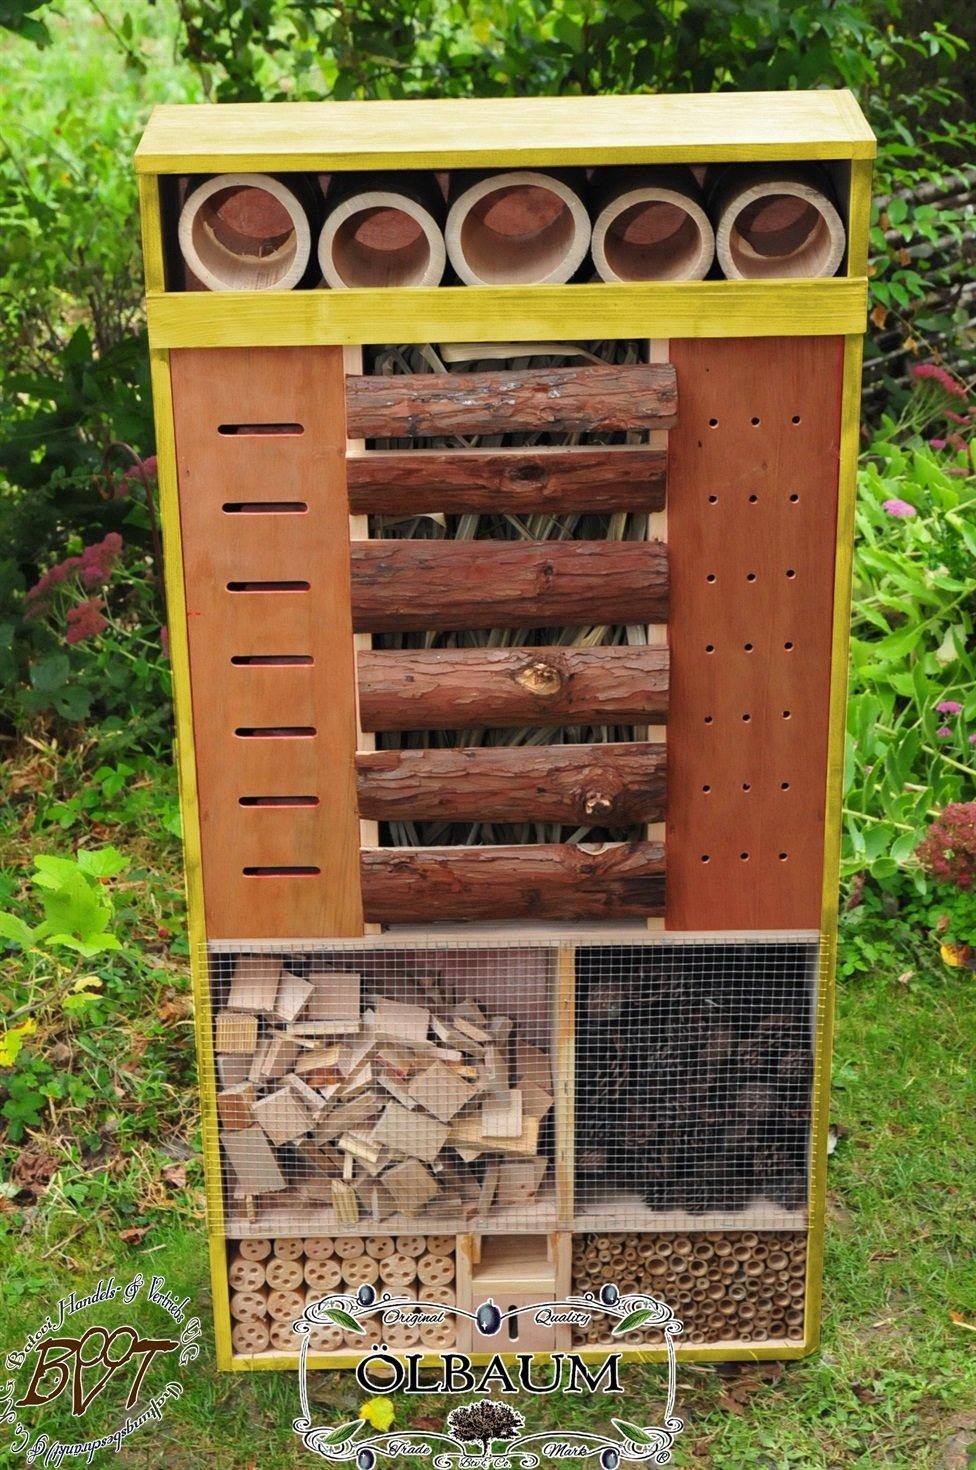 WETTERFEST 122 x 60 cm MEGA-XXL NEU BTV Batovi Insektenhotel Ausf/ührung Naturholz MIT WETTERSCHUTZ-Front f/ür trockenes Futter